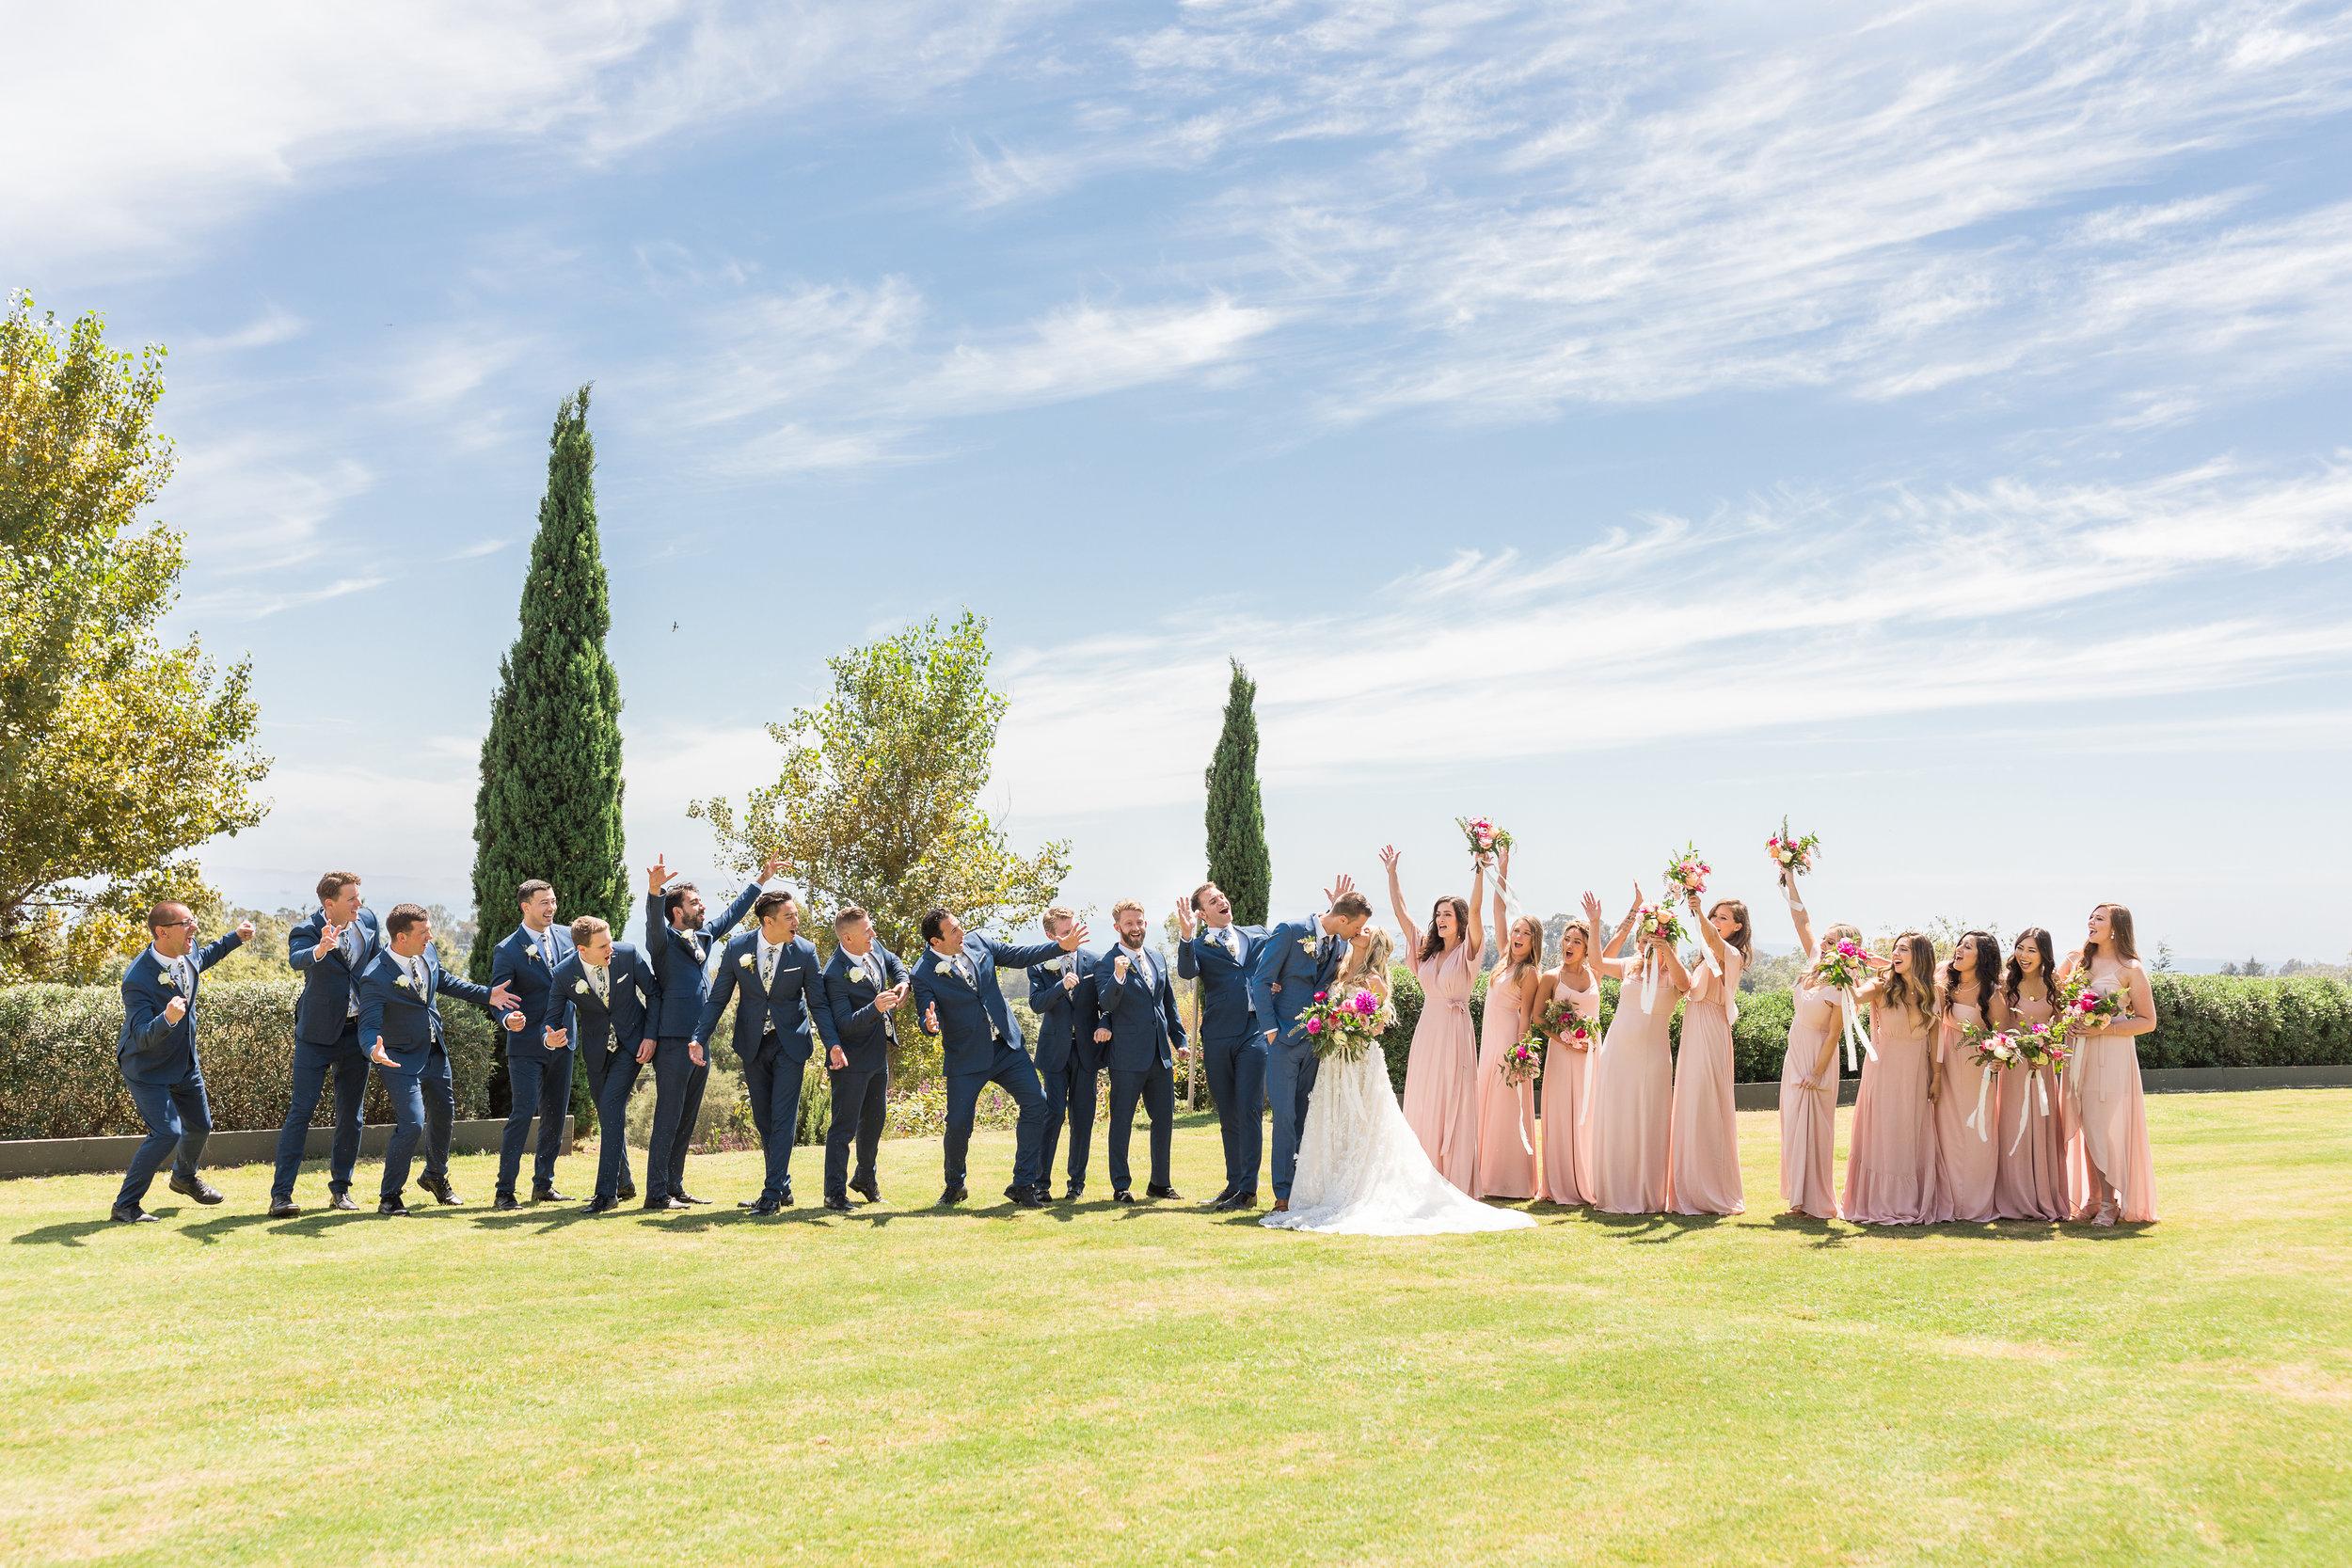 molly-terrill-wedding-preview-3.jpg